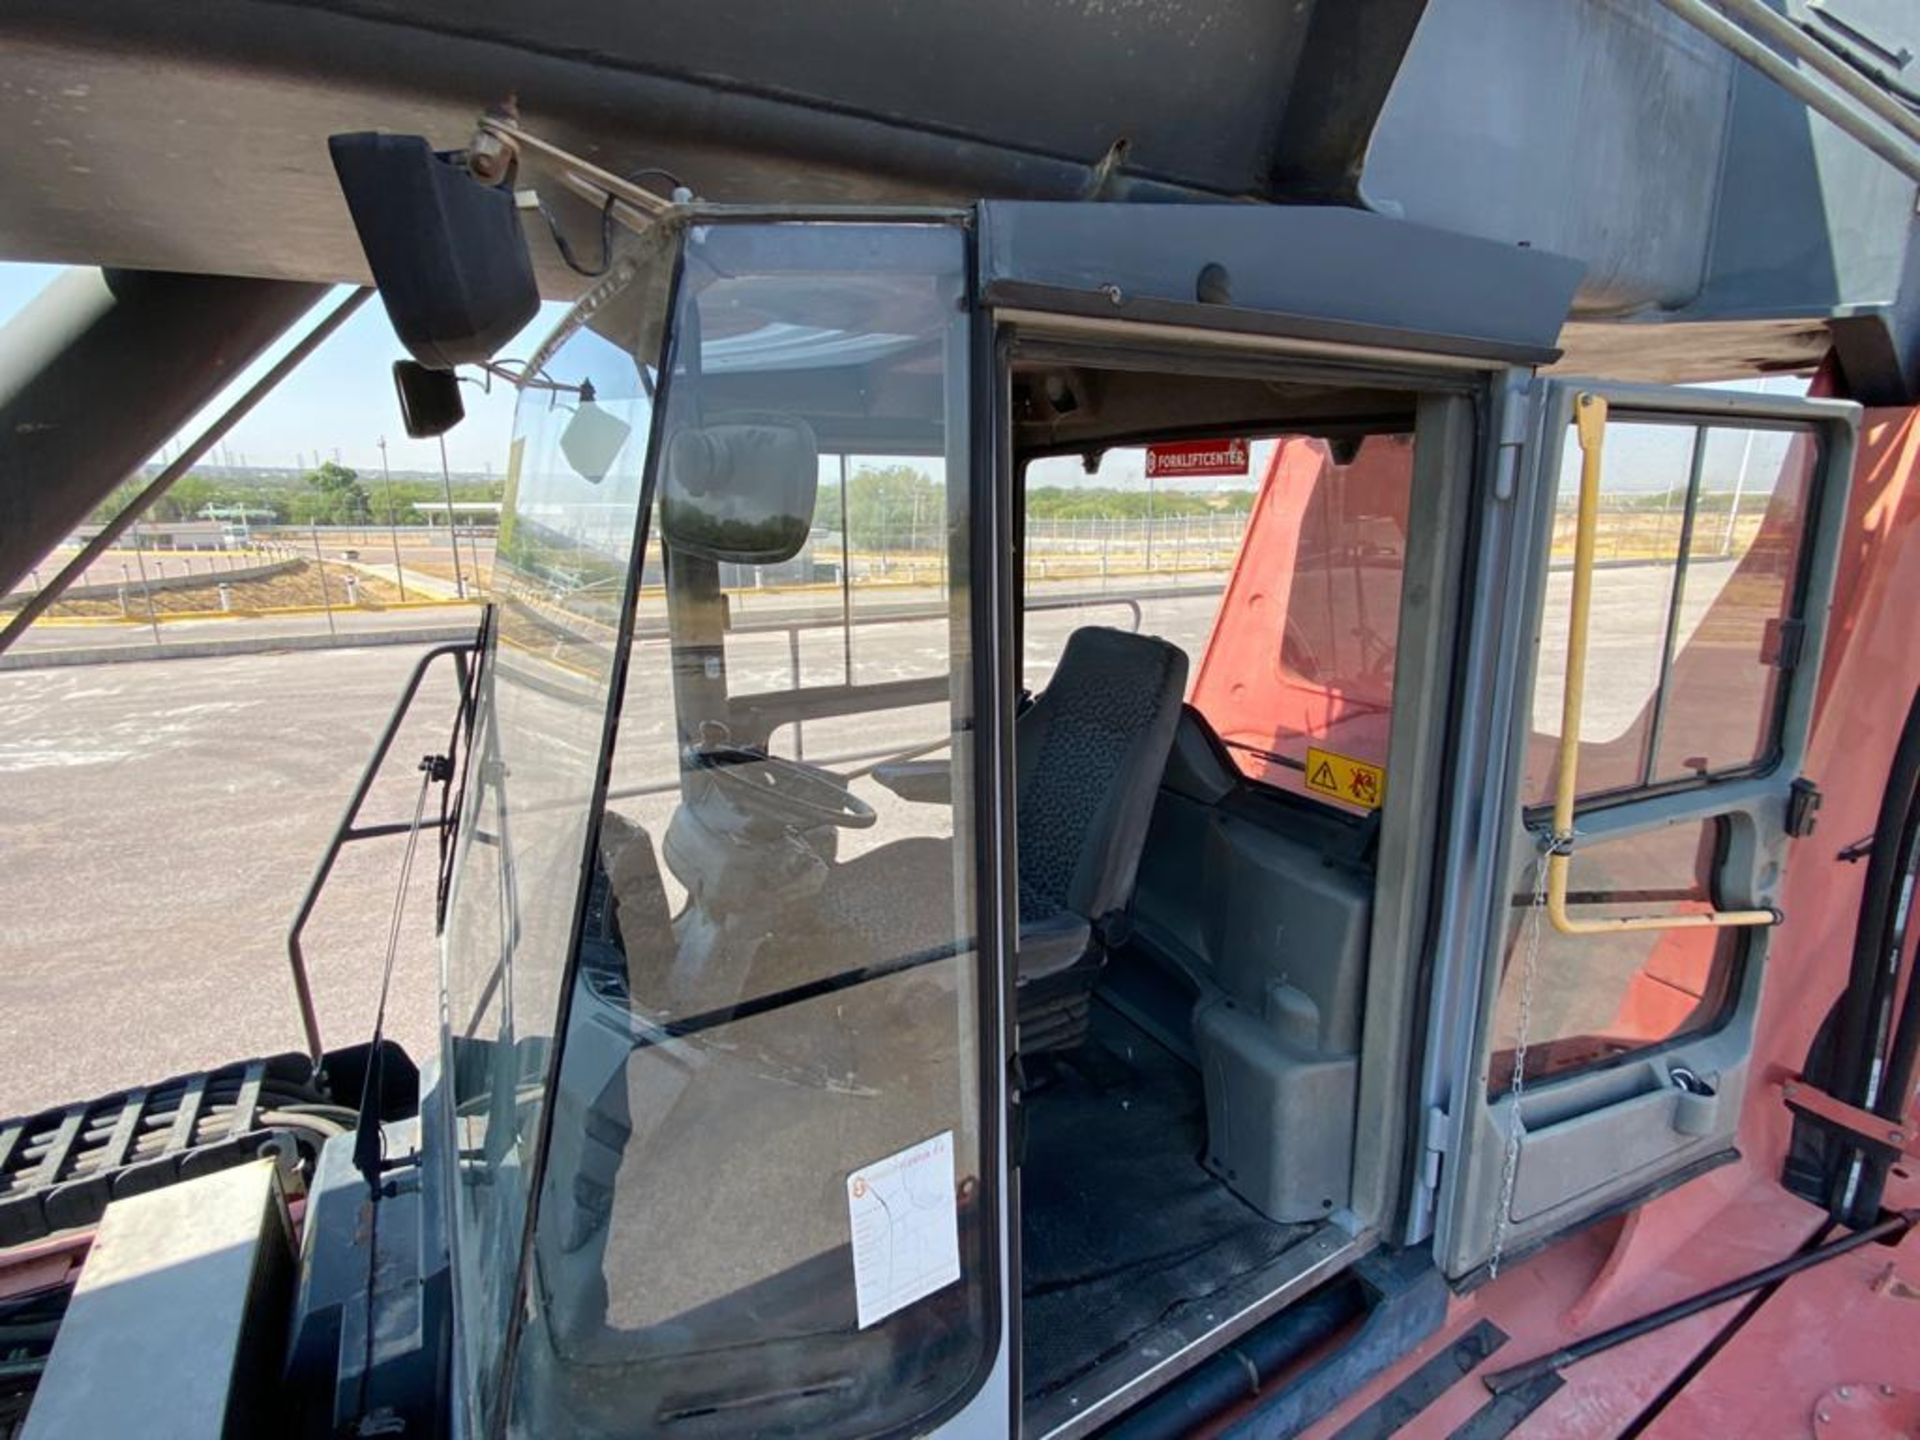 Reach Stacker marca Kalmar, año 2004, modelo DRS4531-55, No de serie T341140079 - Image 31 of 57